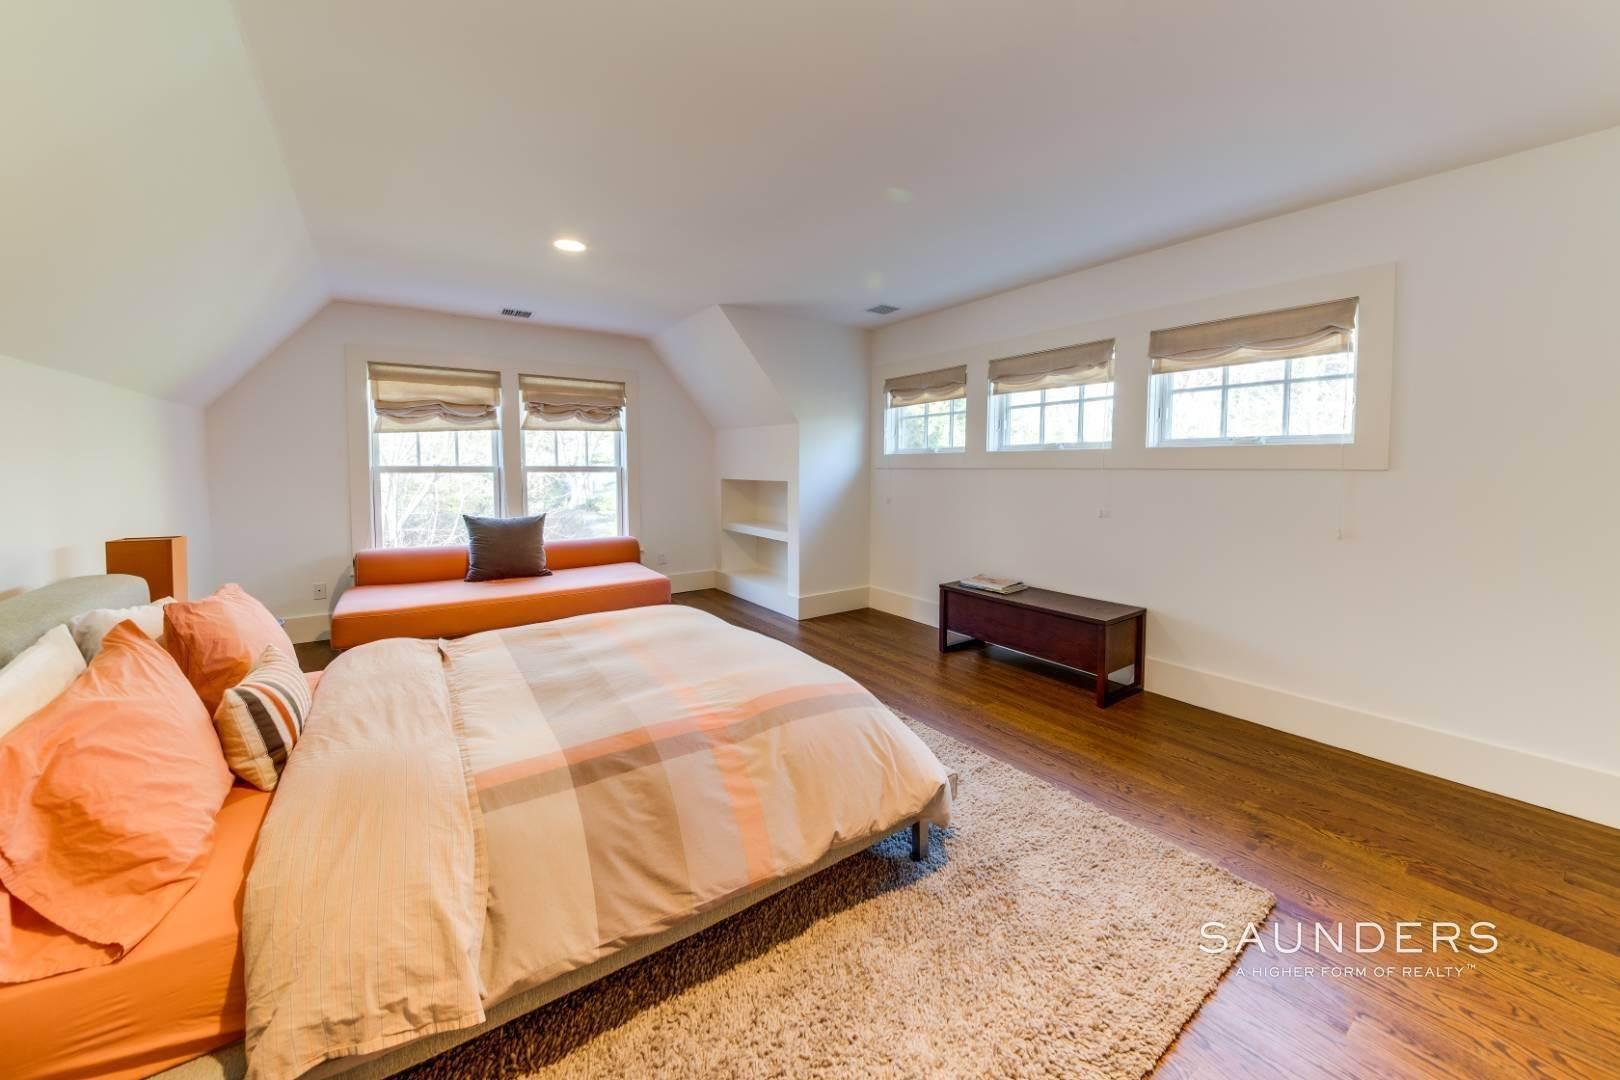 19. Single Family Homes for Sale at Wainscott South Traditional Near Beach Lane 10 Merriwood Drive, Wainscott, East Hampton Town, NY 11975